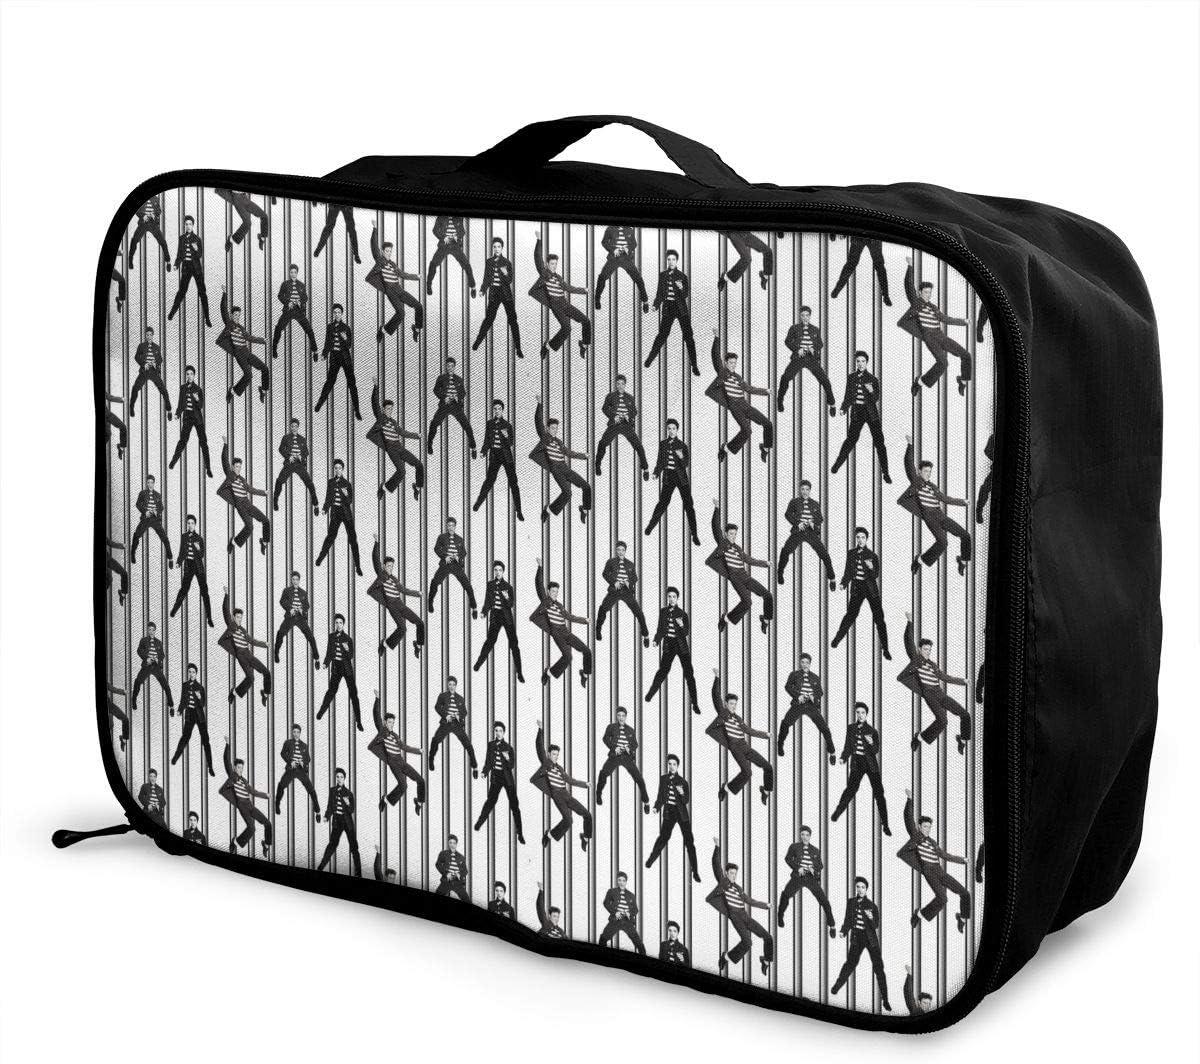 Travel Luggage Duffle Bag Lightweight Portable Handbag Retro Design Print Large Capacity Waterproof Foldable Storage Tote